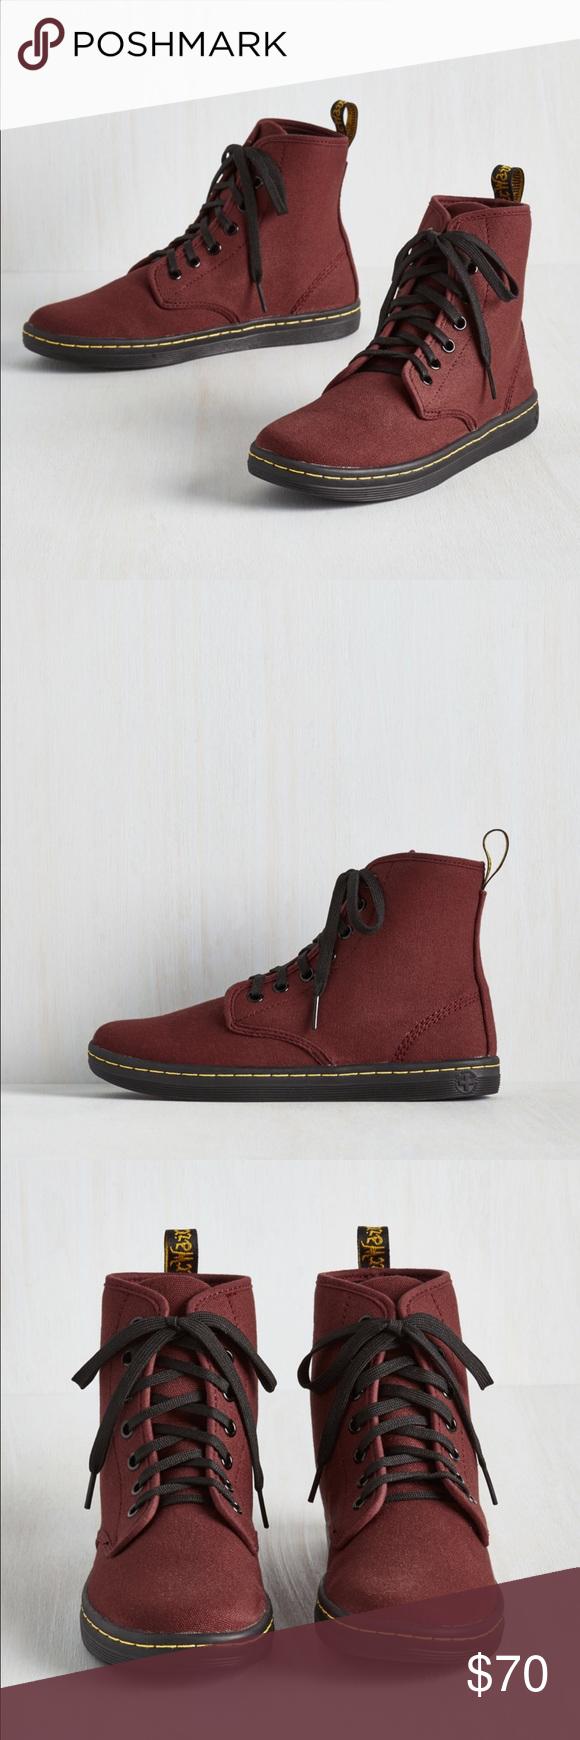 Dr. Martens Shoreditch Canvas Boots